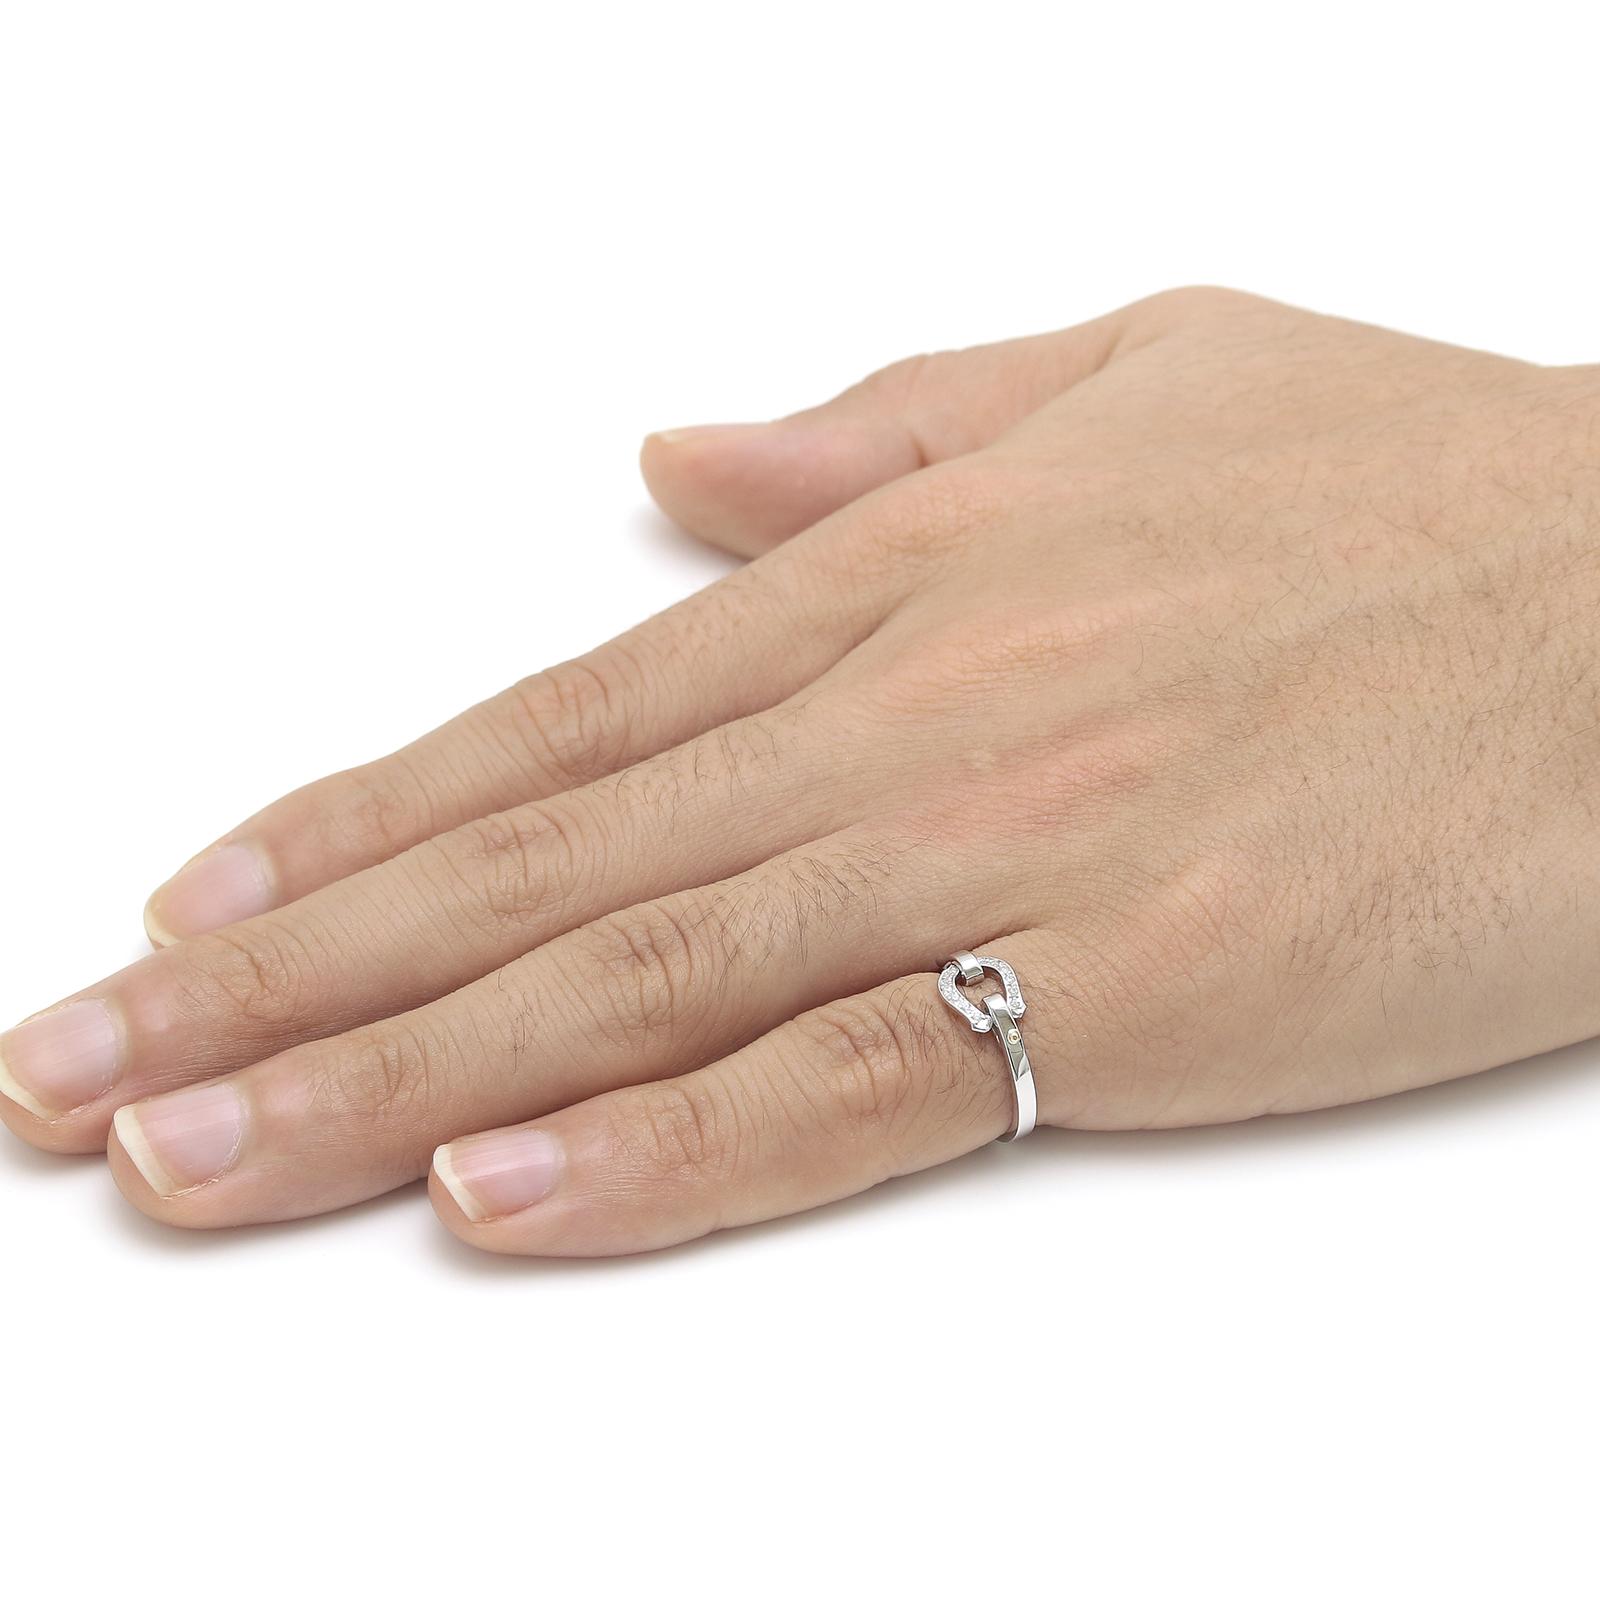 Horseshoe Band Ring Small - Silver w/CZ